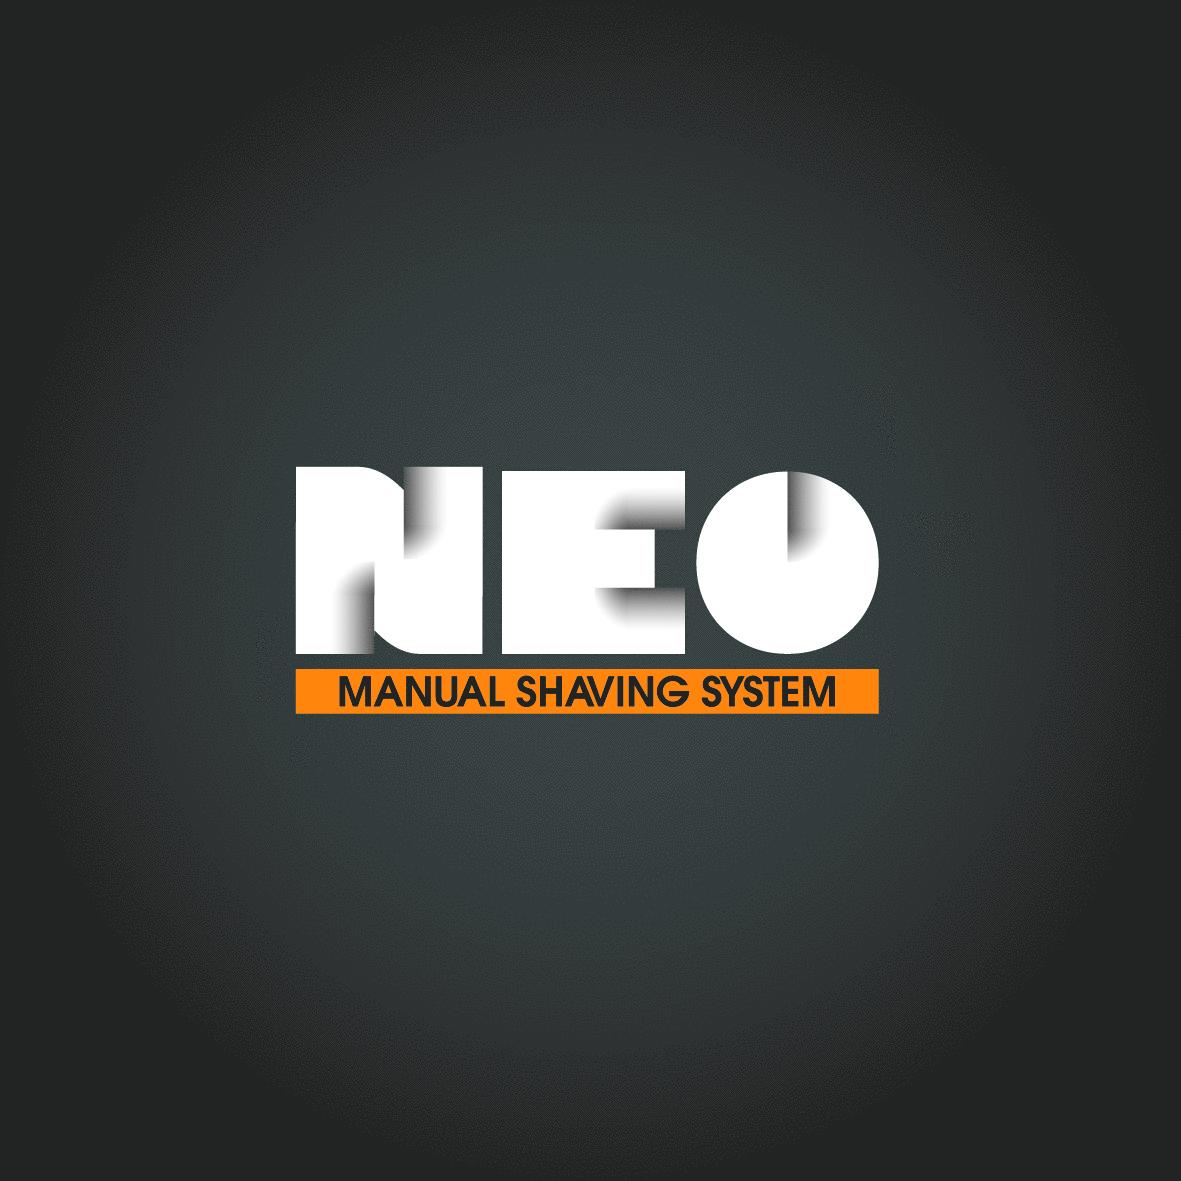 NEO MANUAL SHAVING SYSTEM